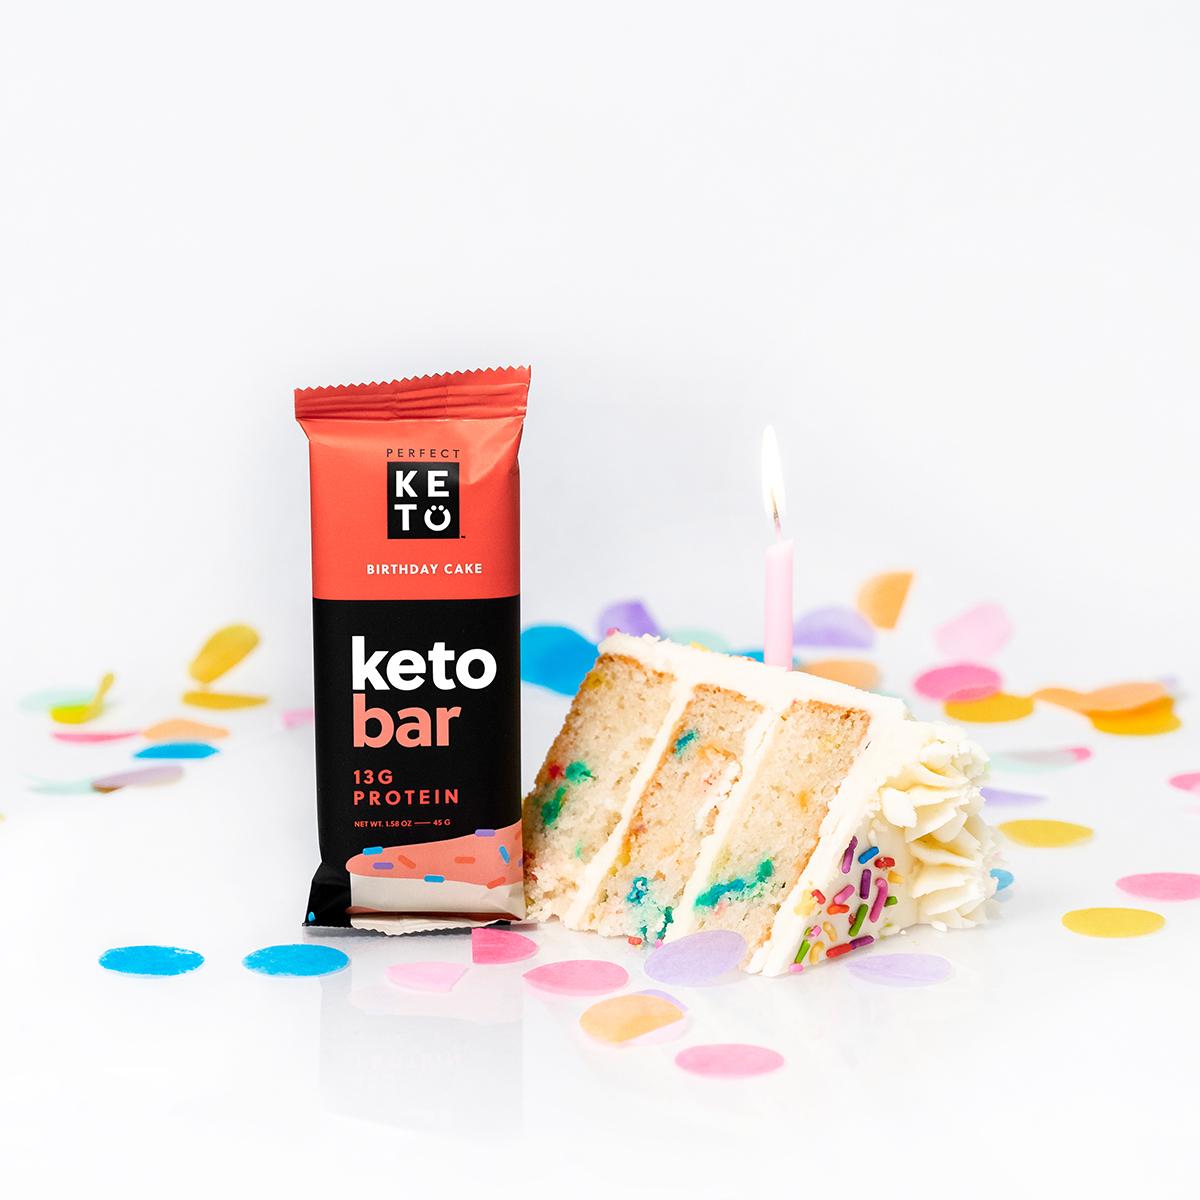 KetoBar-BirthdayCake-BarFront-_Cake-Confetti-OnWhite.jpg